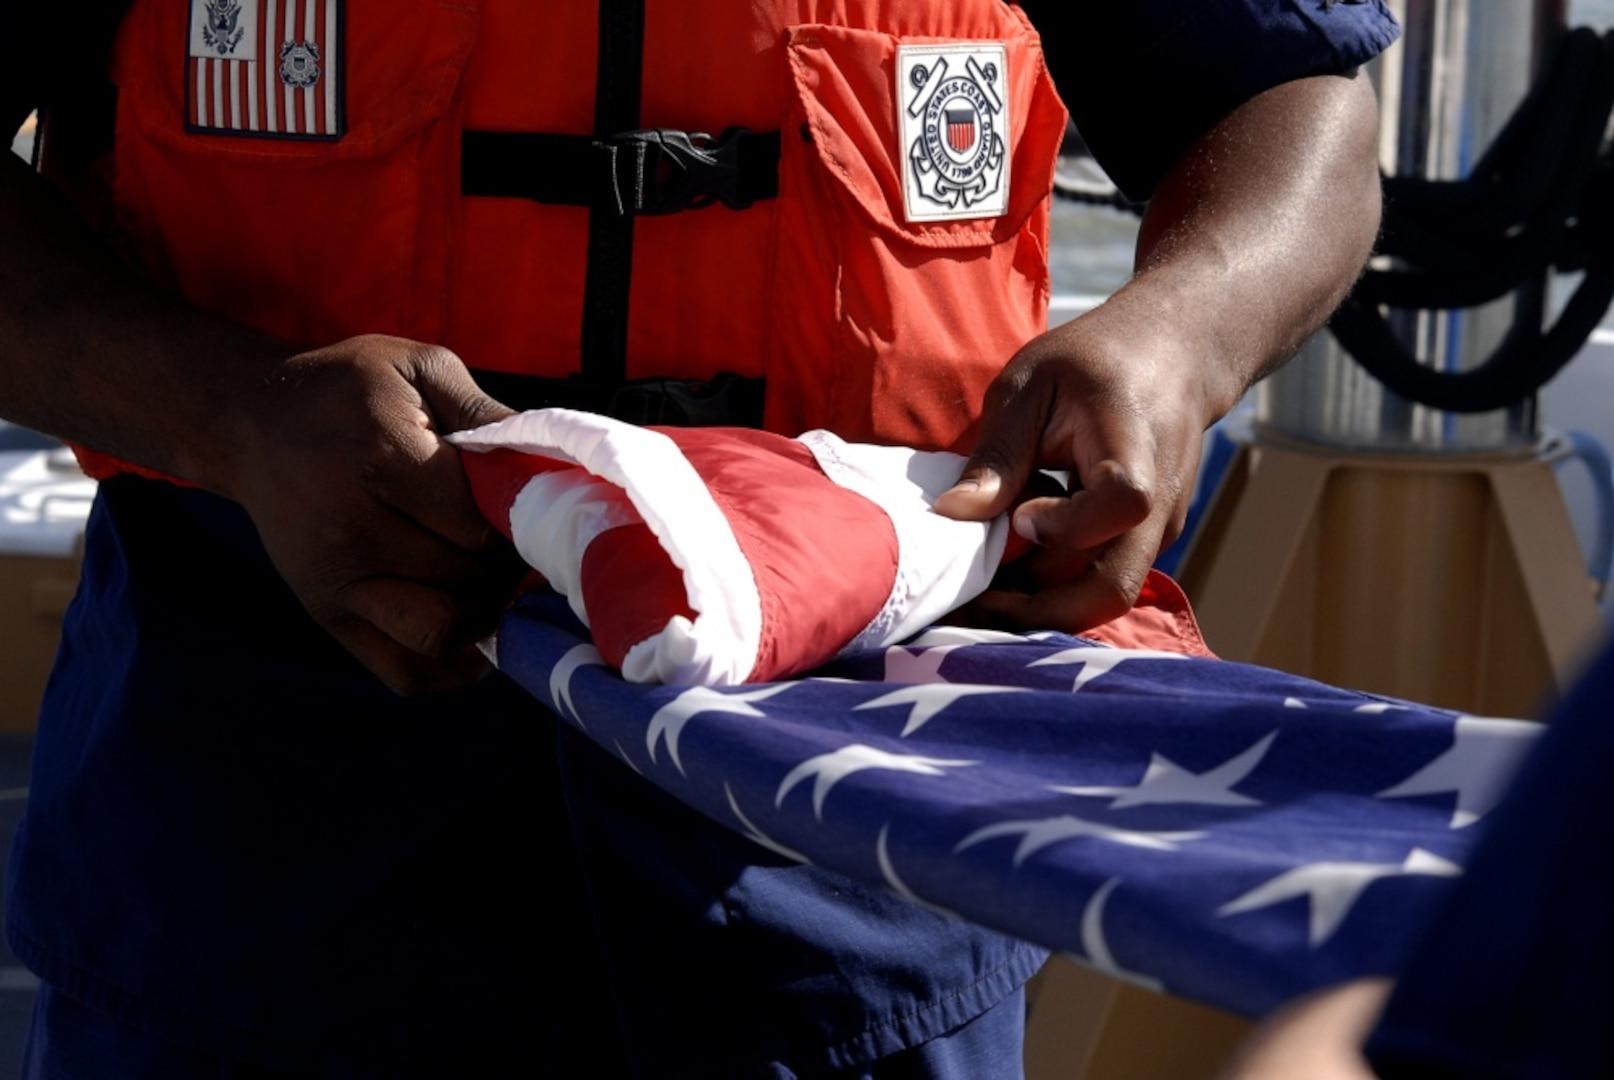 Coast Guard member folds National Ensign